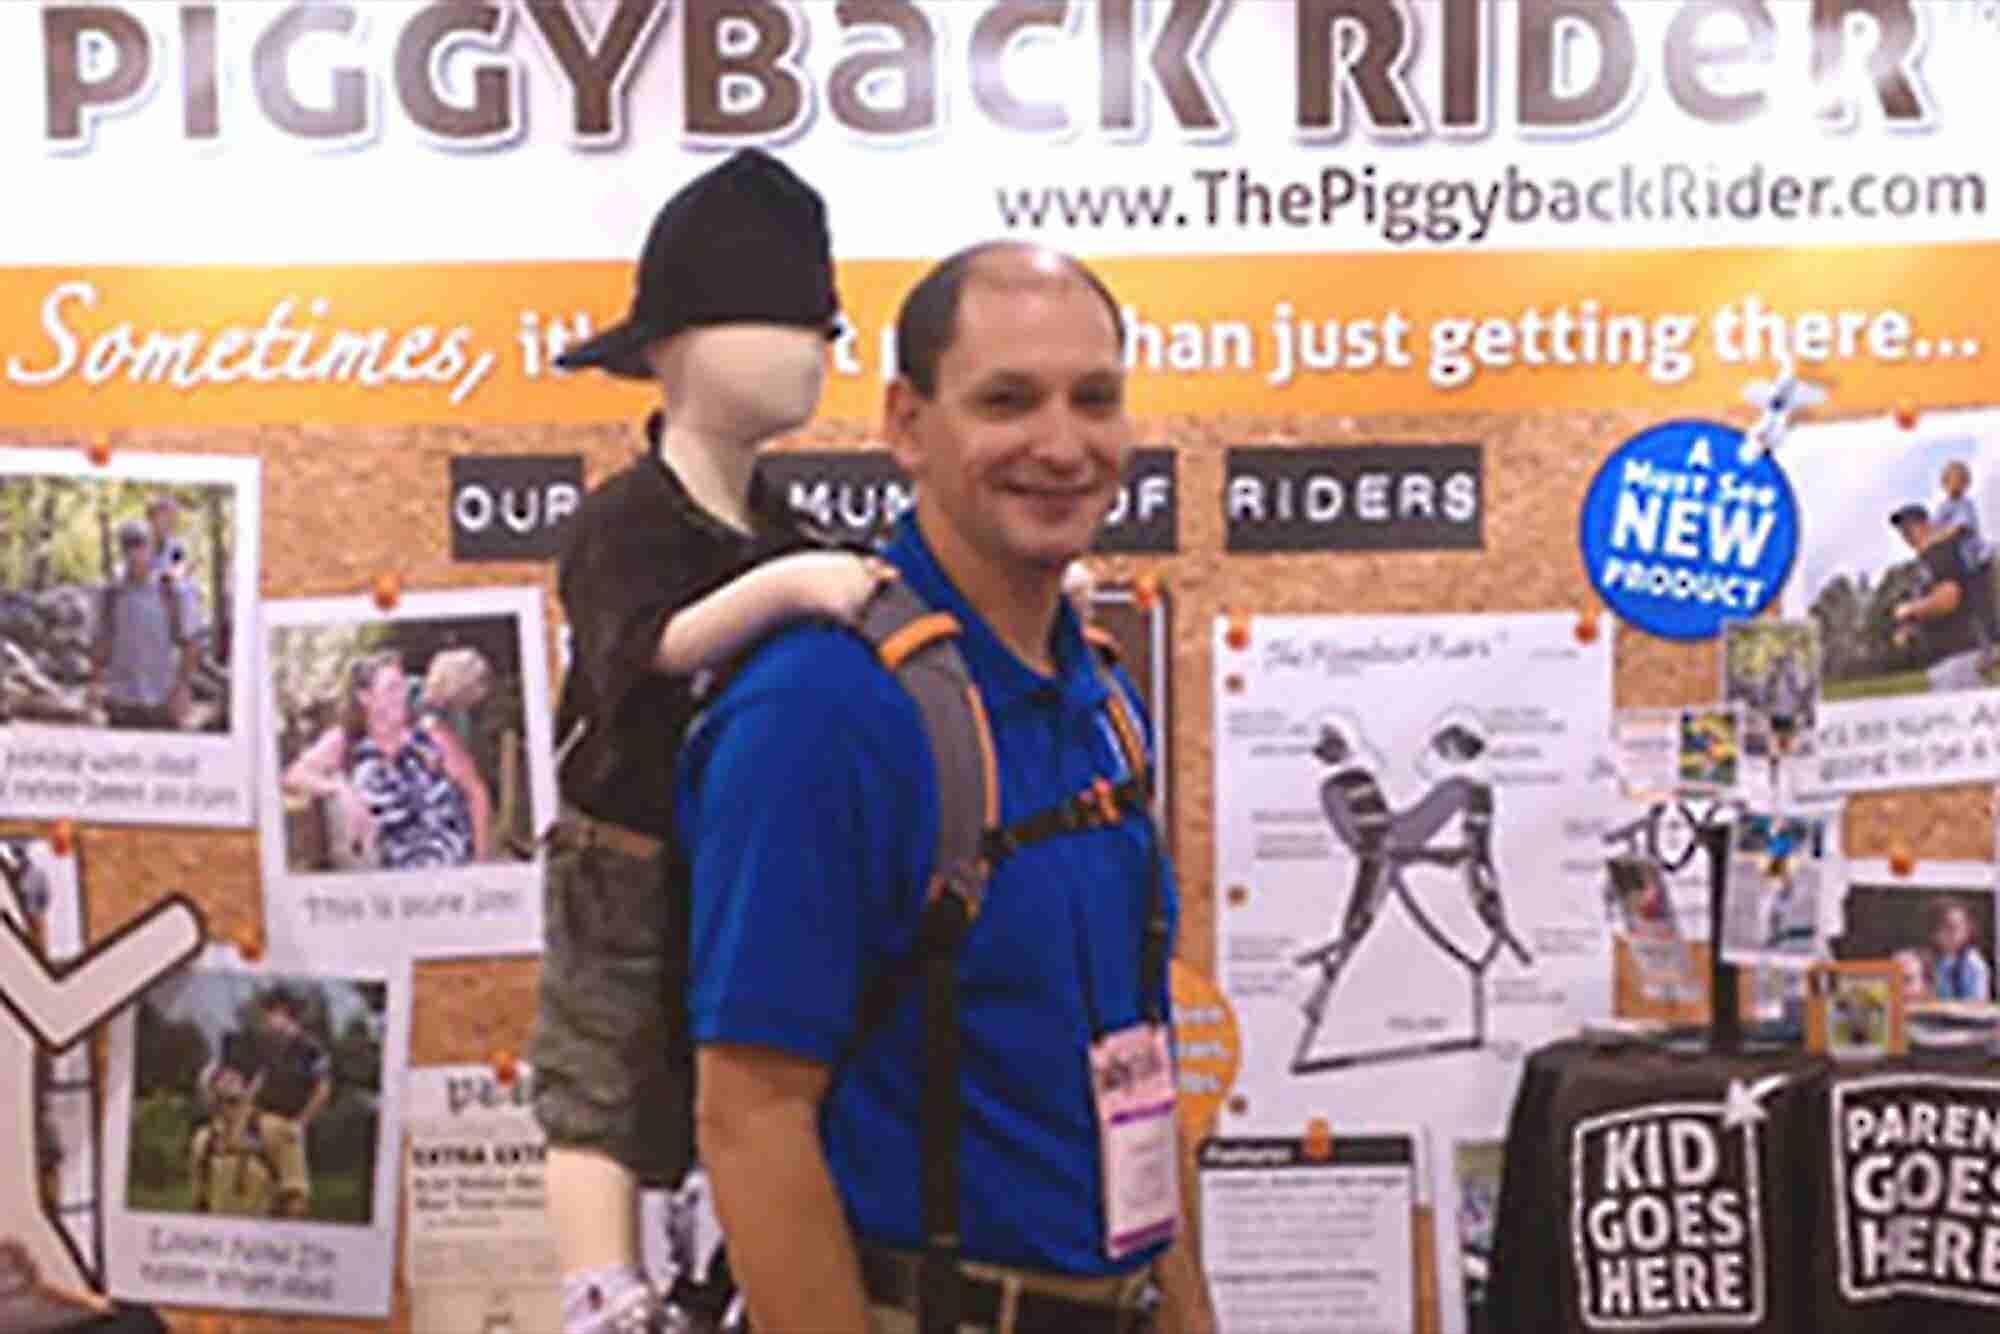 A Virtual Business Built on a Piggyback Ride